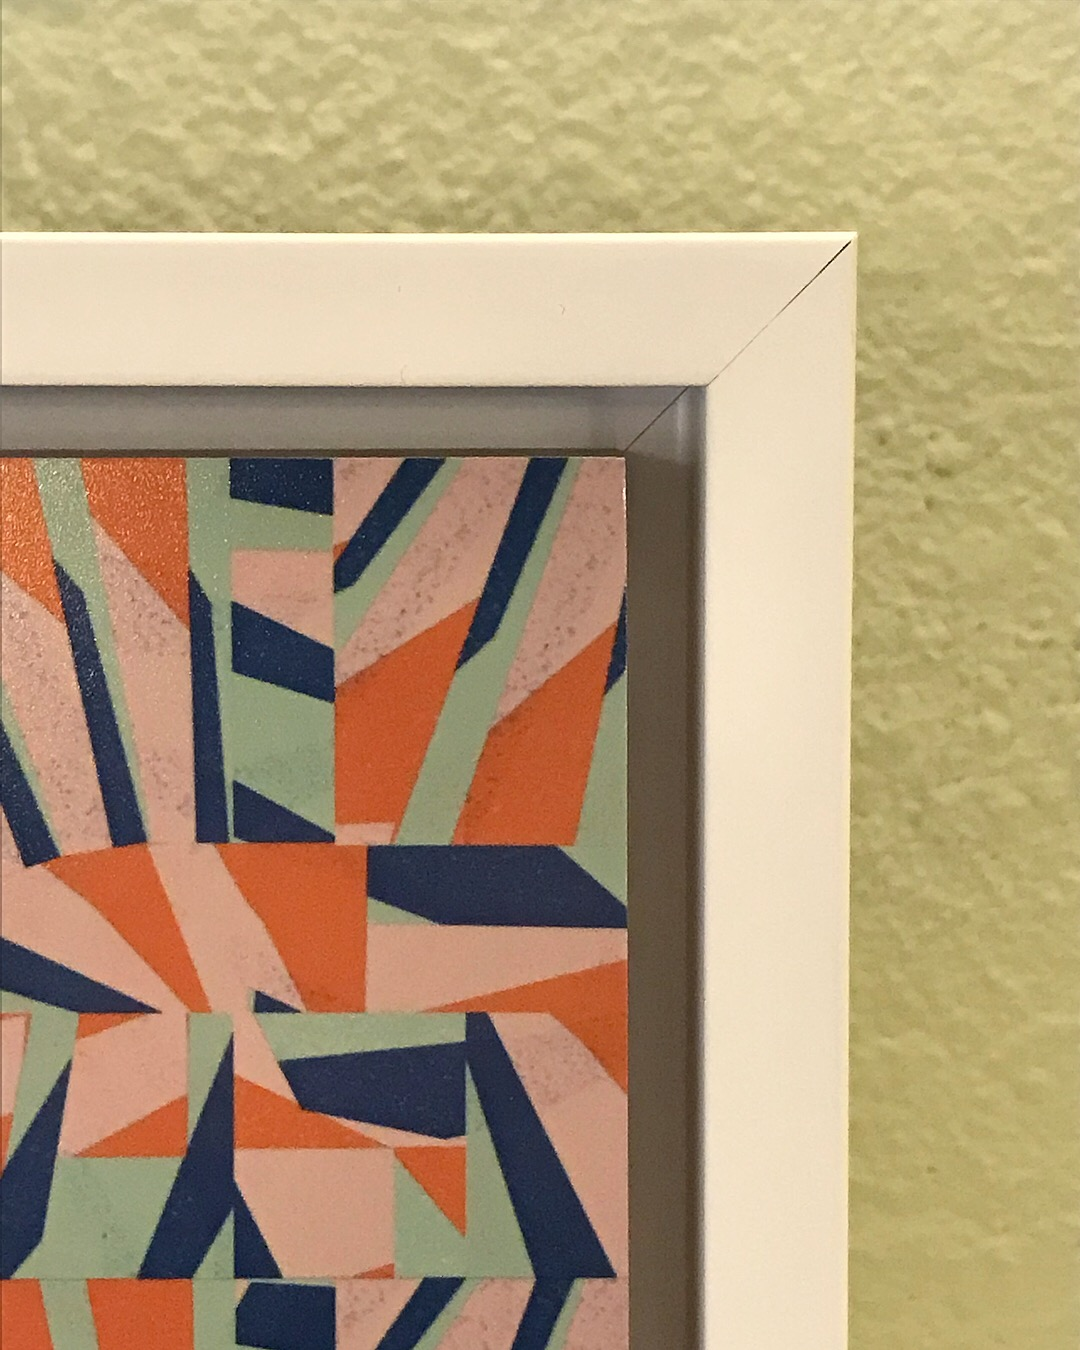 plywerk-color-structure-6-jessica-poundstone-closeup.JPG